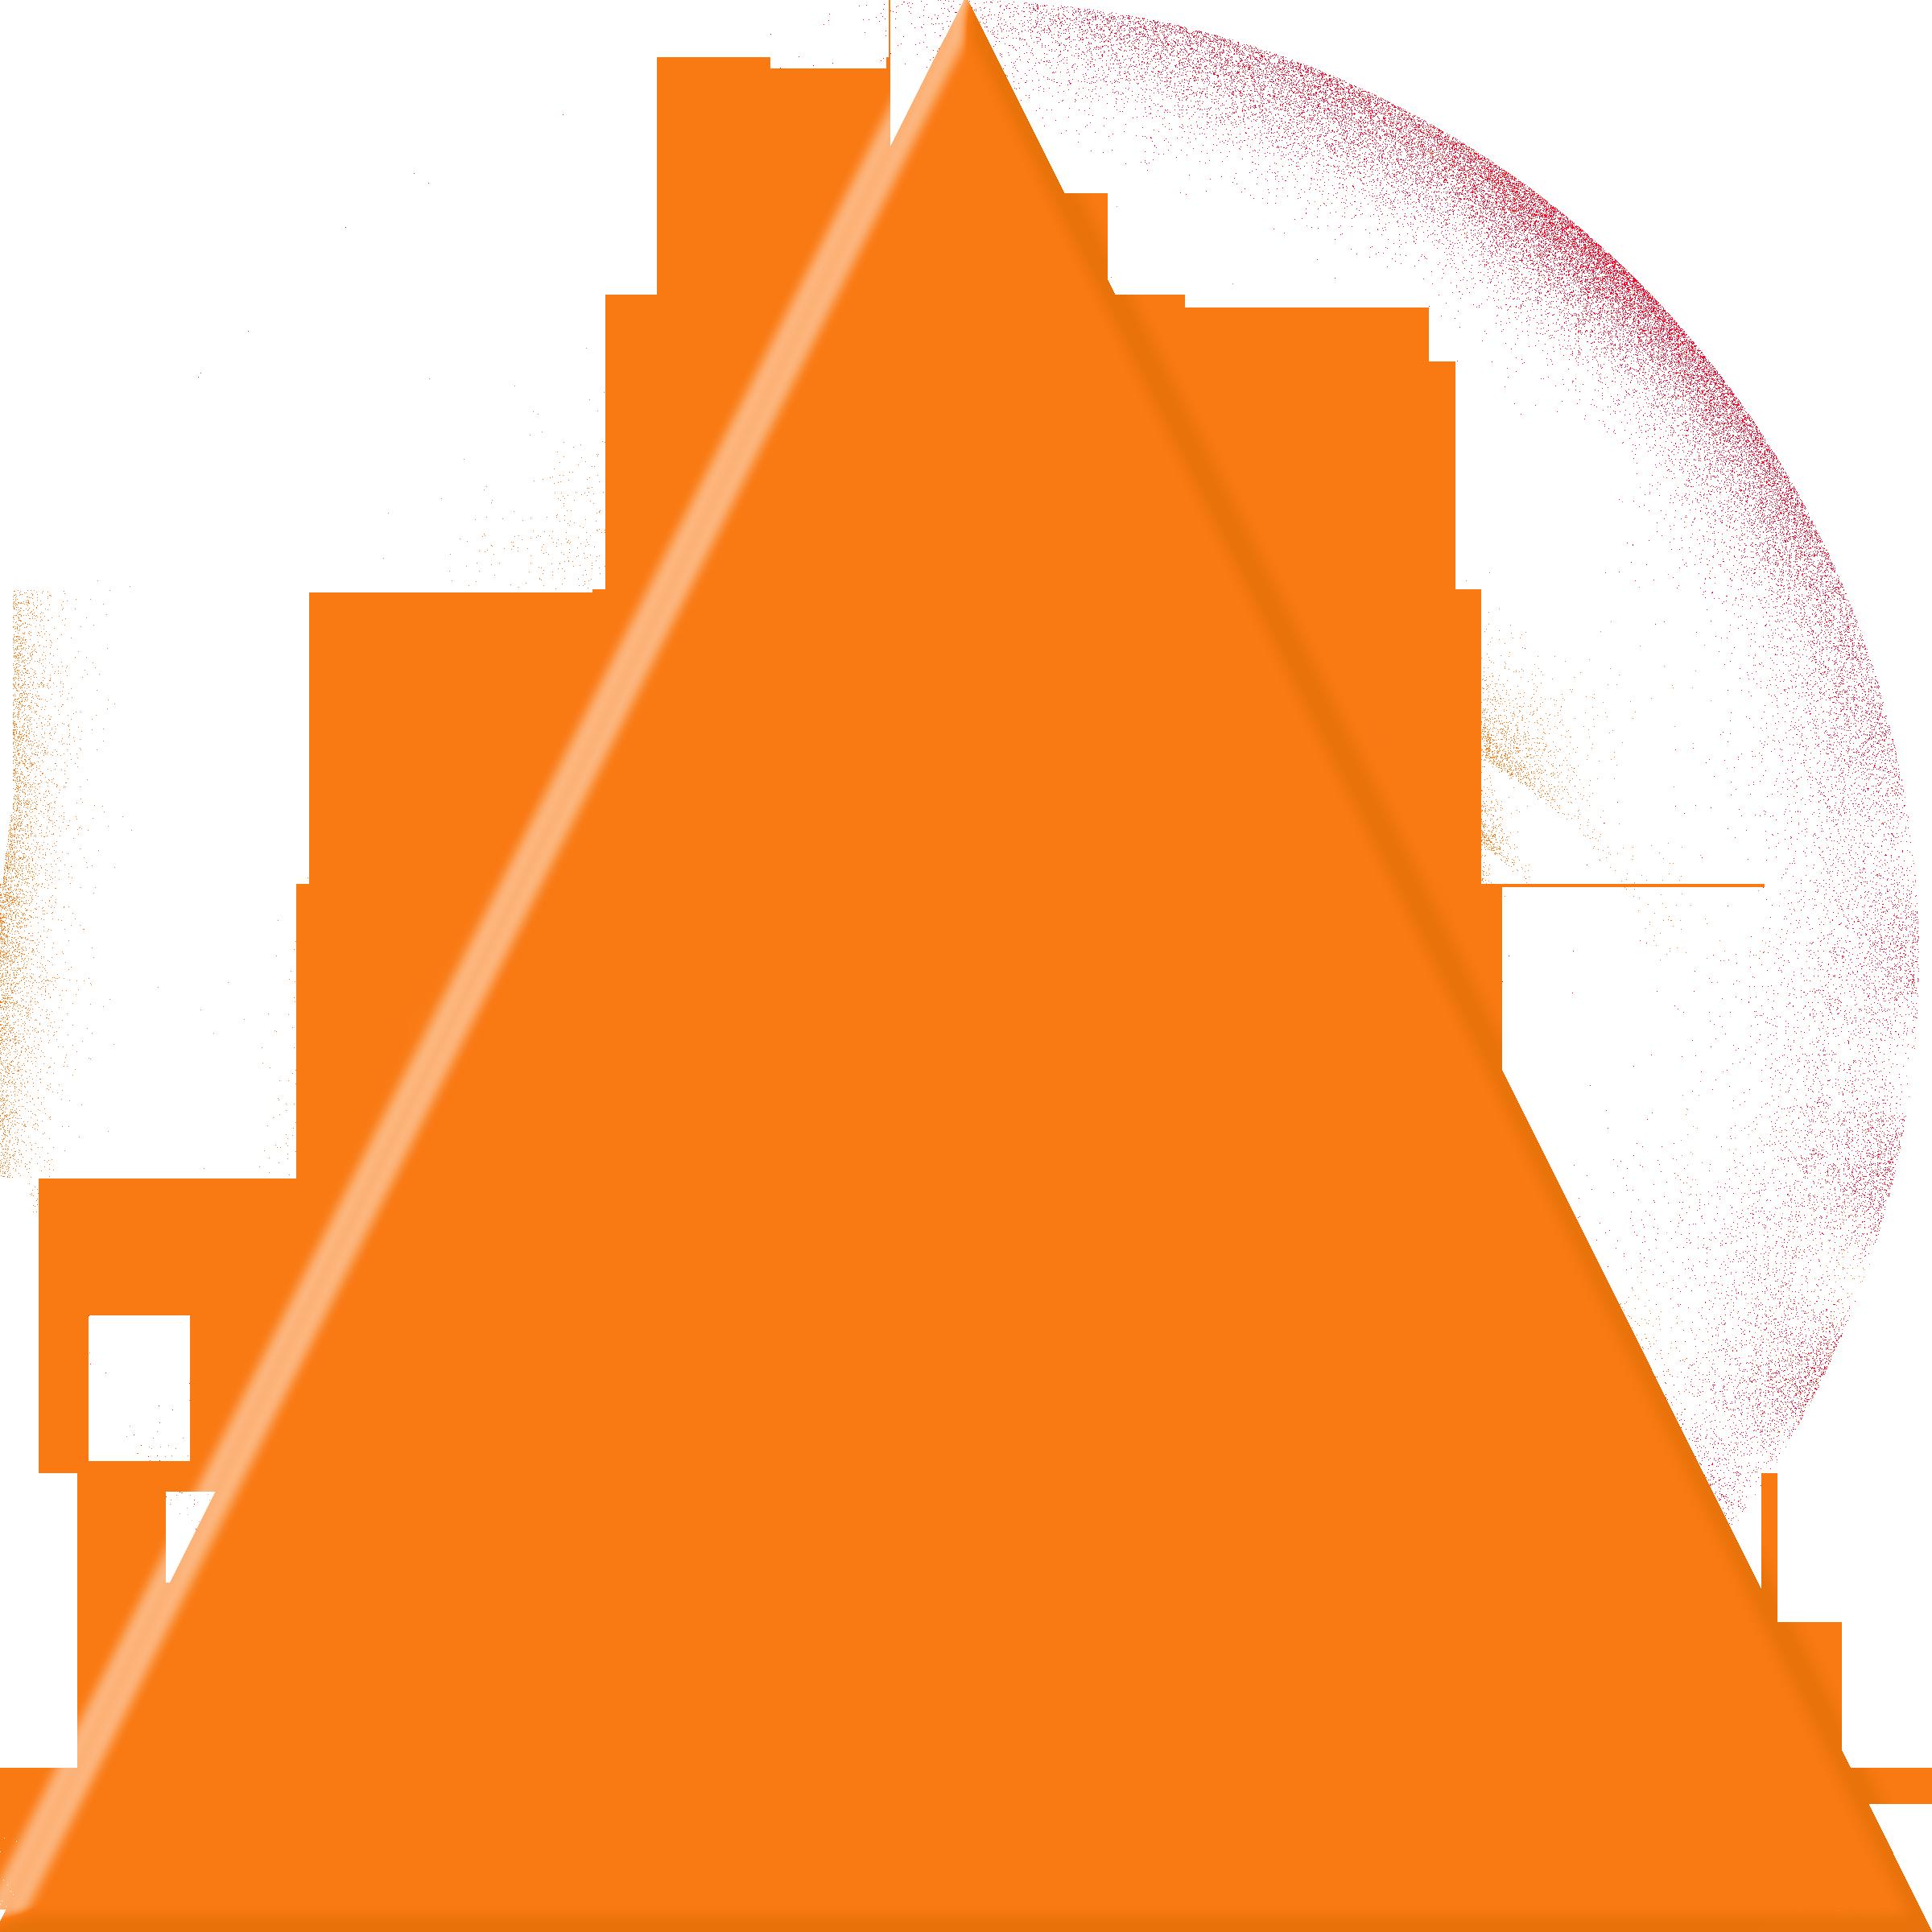 orange triangle free images at clker com vector clip art online rh clker com triangle clip art images triangle clip art shapes